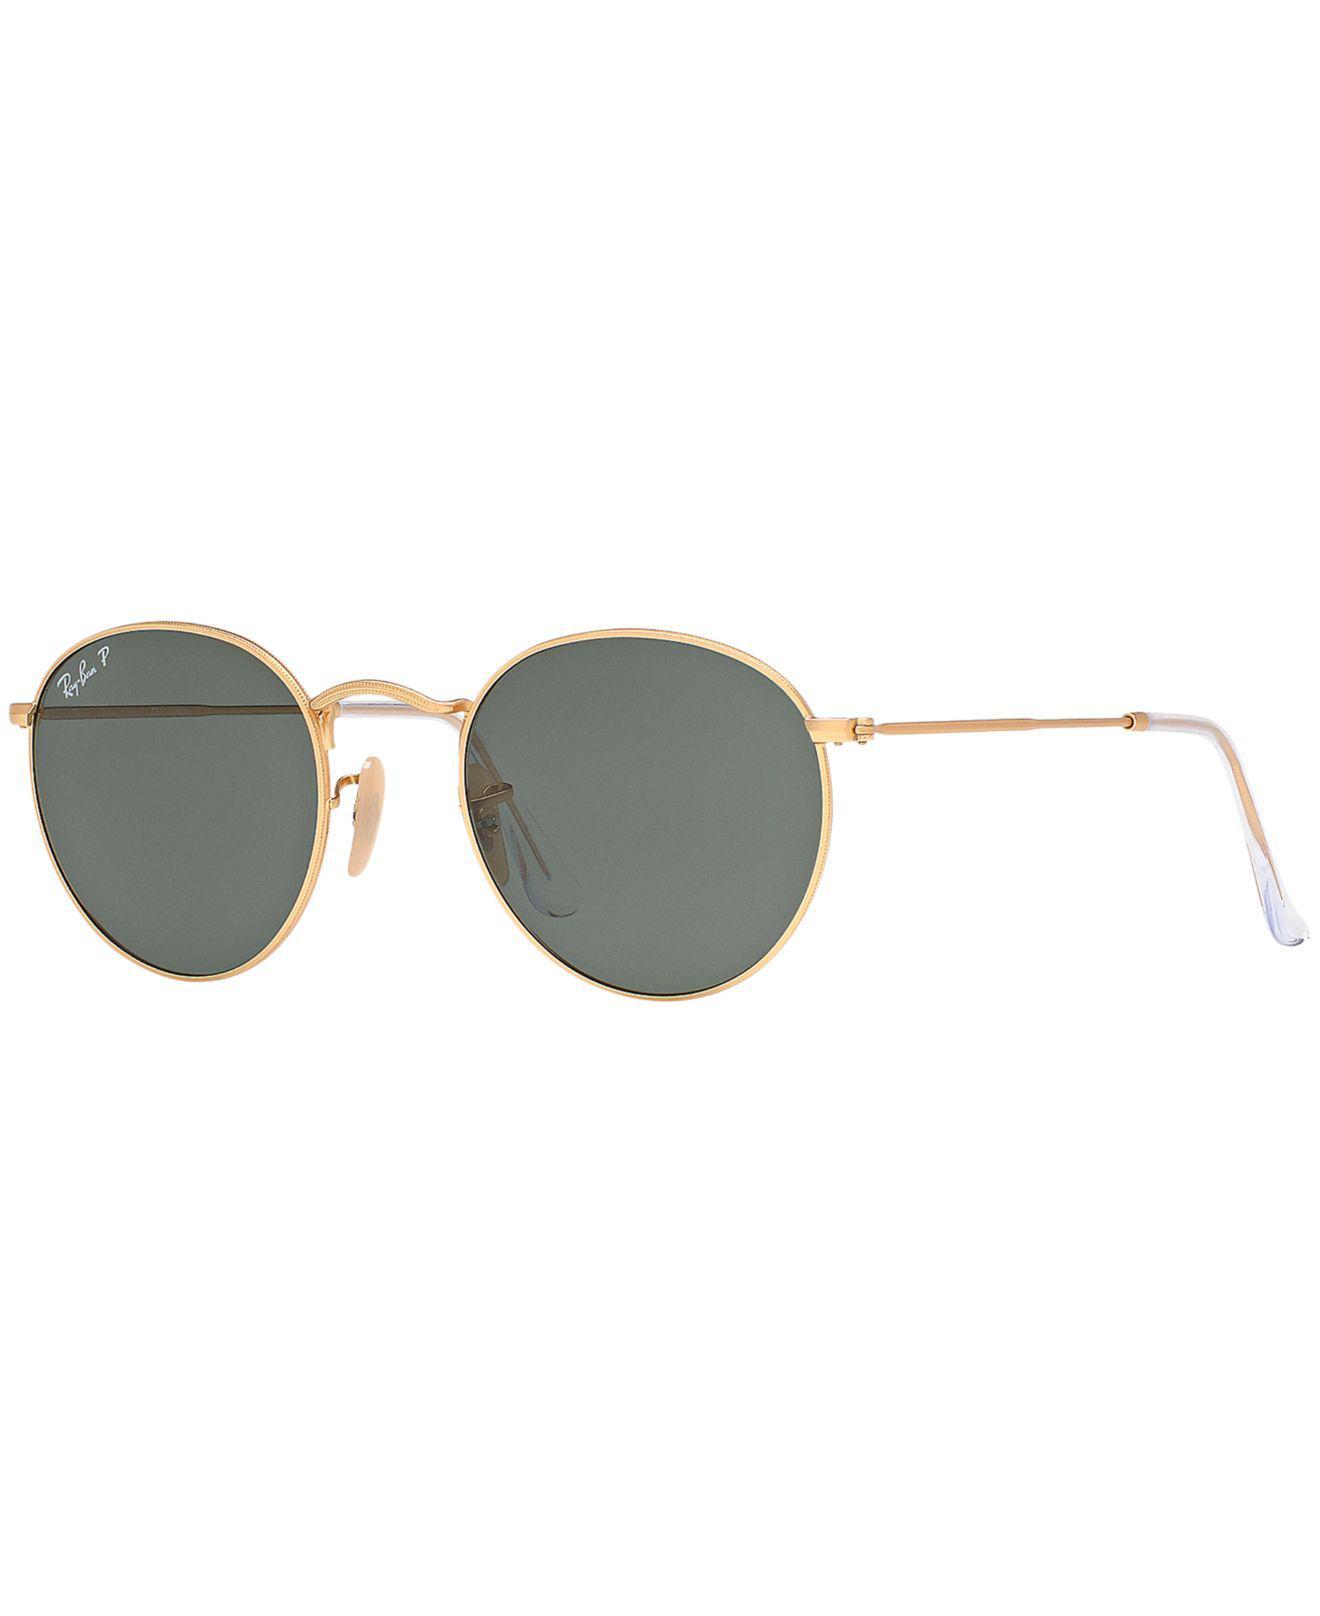 199038b1ce3 Ray-Ban. Women s Metallic Sunglasses